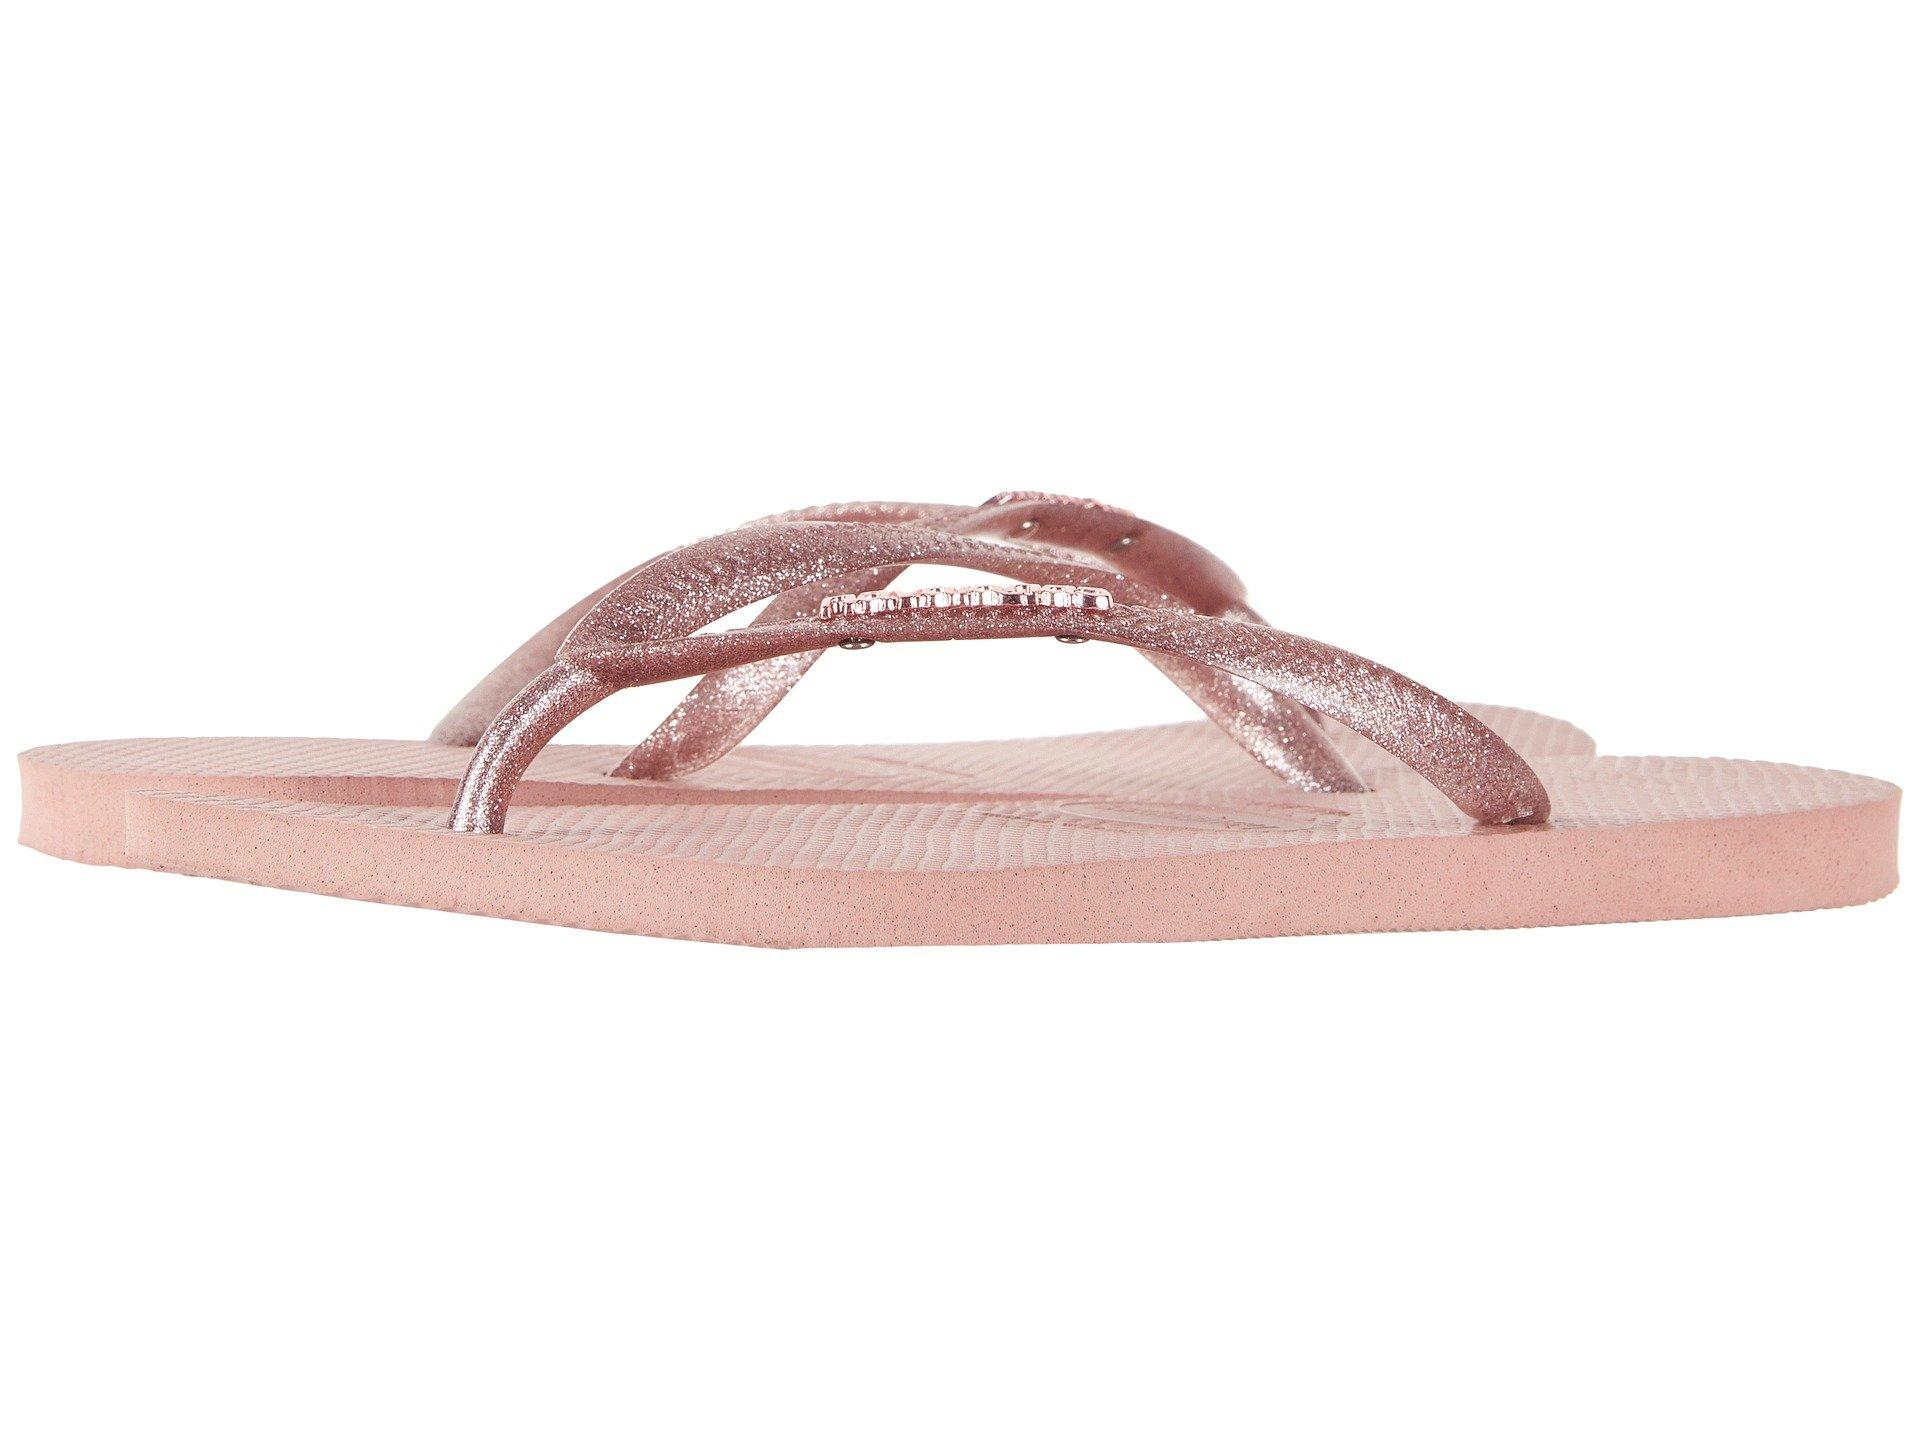 5cb502315 Lyst - Havaianas Slim Logo Metallic Flip Flops in Pink - Save 53%